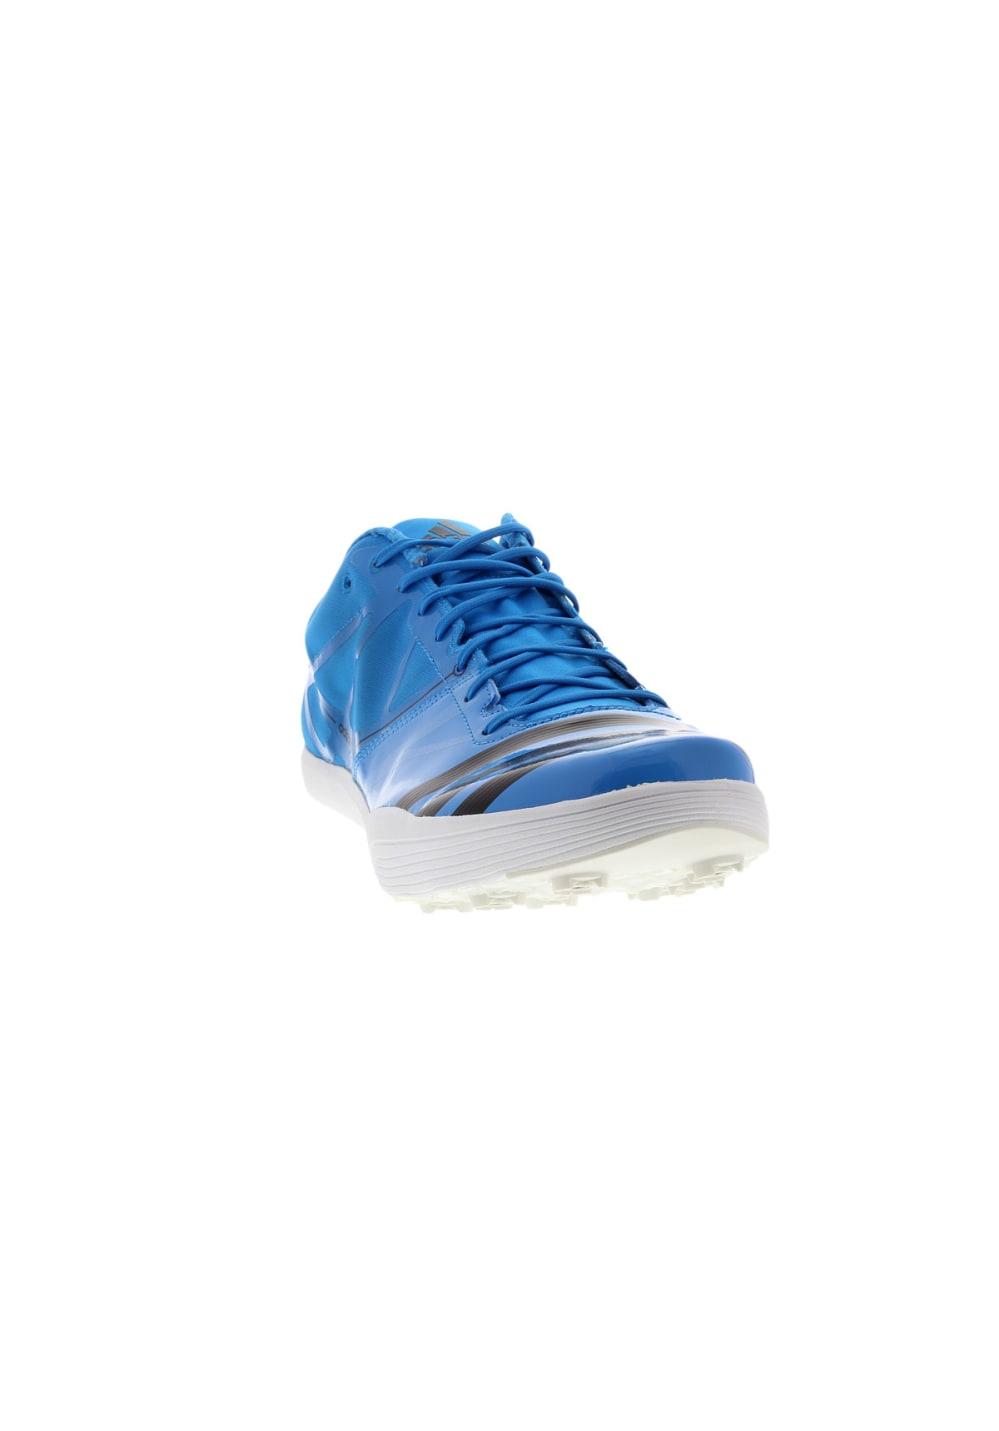 Bleu Adidas 2 Pointes Chaussures Lj Adizero 1uFKclJT3